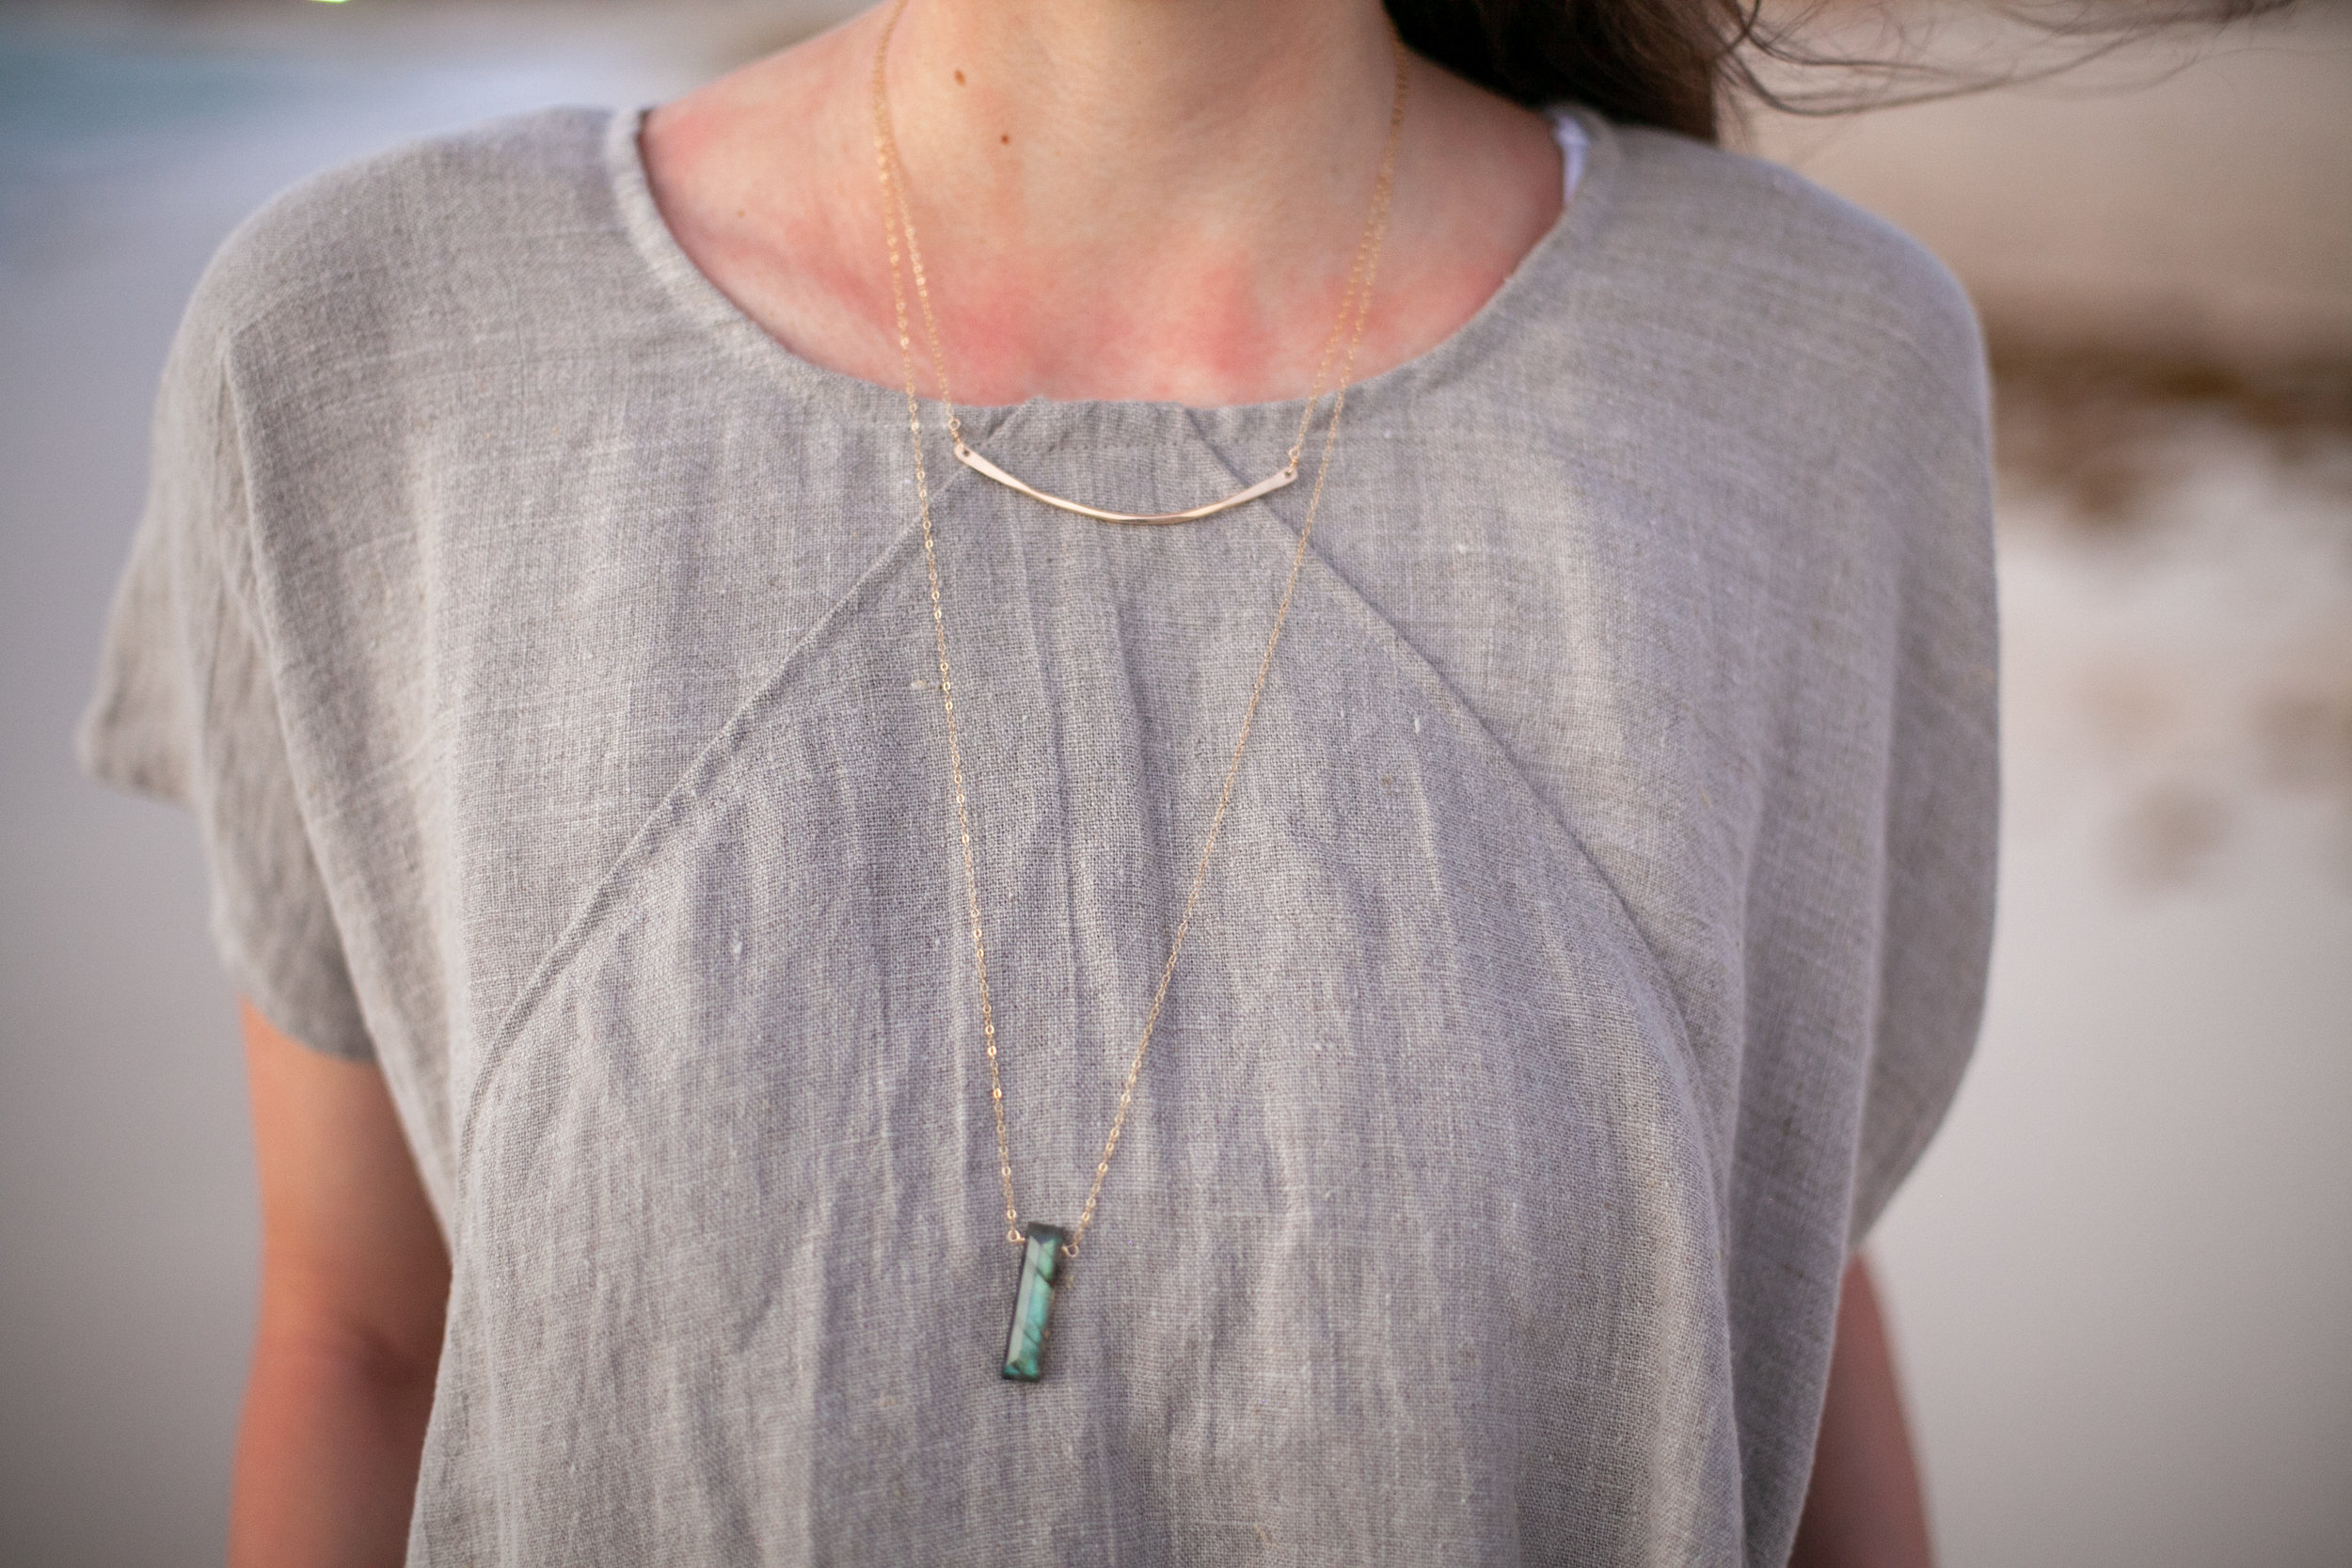 Sarah Cornwell Jewelry by Avi Loren Fox LLC in Caribbean Mexico-3.jpg